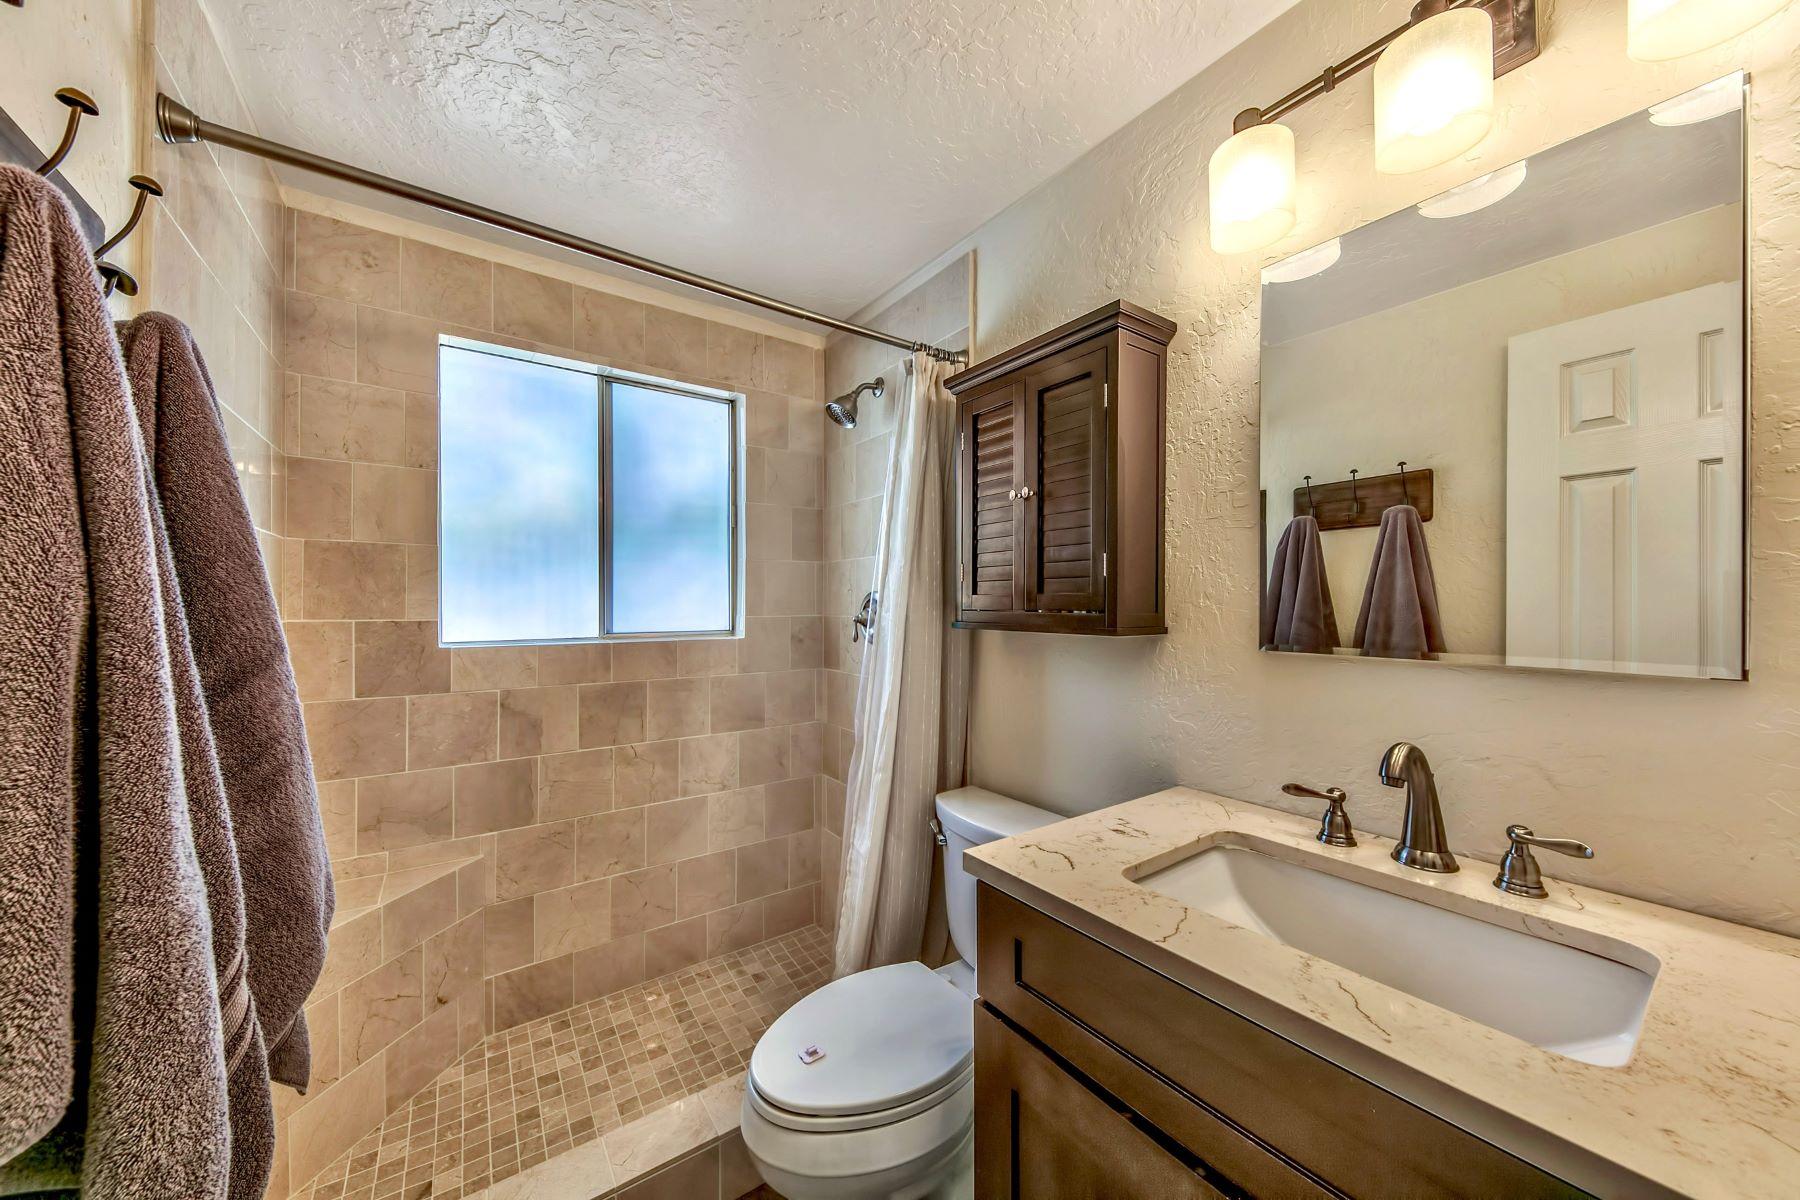 Additional photo for property listing at 748 Tina Ct, Stateline NV 89449 748 Tina Ct. Stateline, Nevada 89449 United States